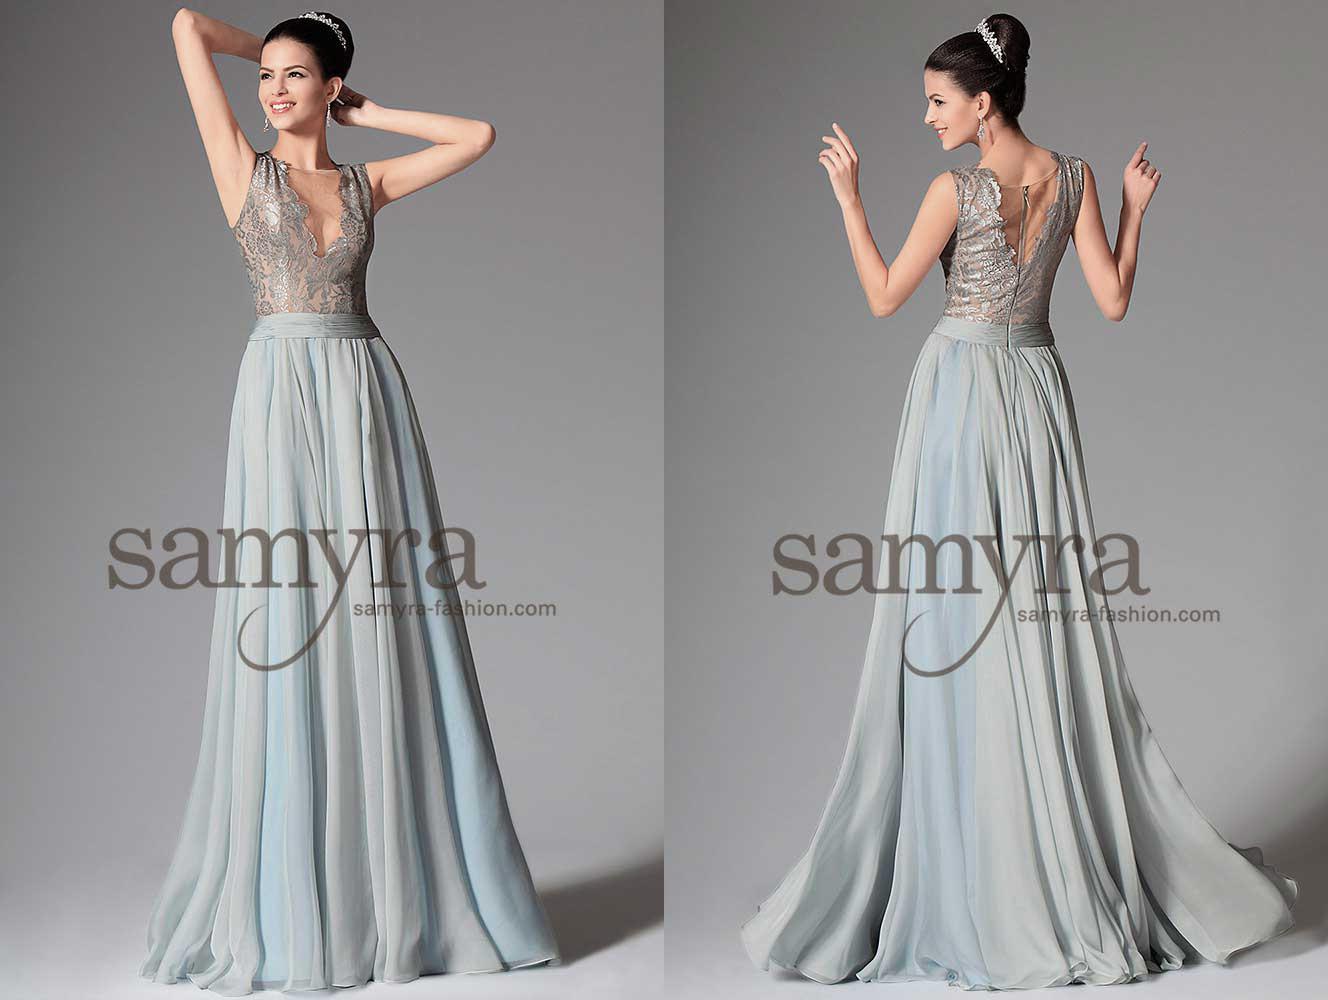 Abend Elegant Abendkleid Online Boutique17 Top Abendkleid Online Bester Preis